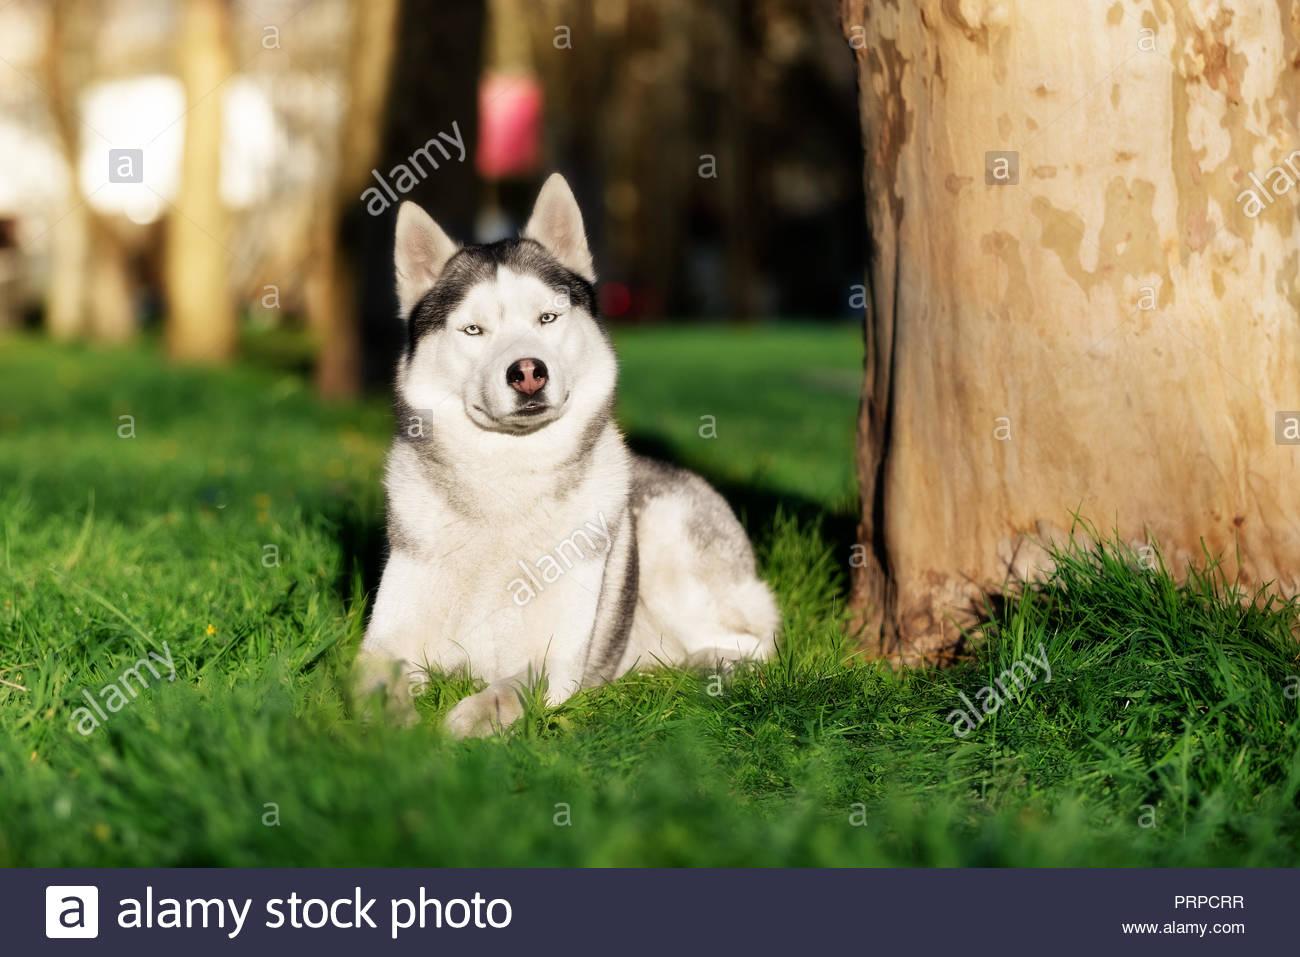 A Beautiful Mature Siberian Husky Male Dog Is Lying Down On The